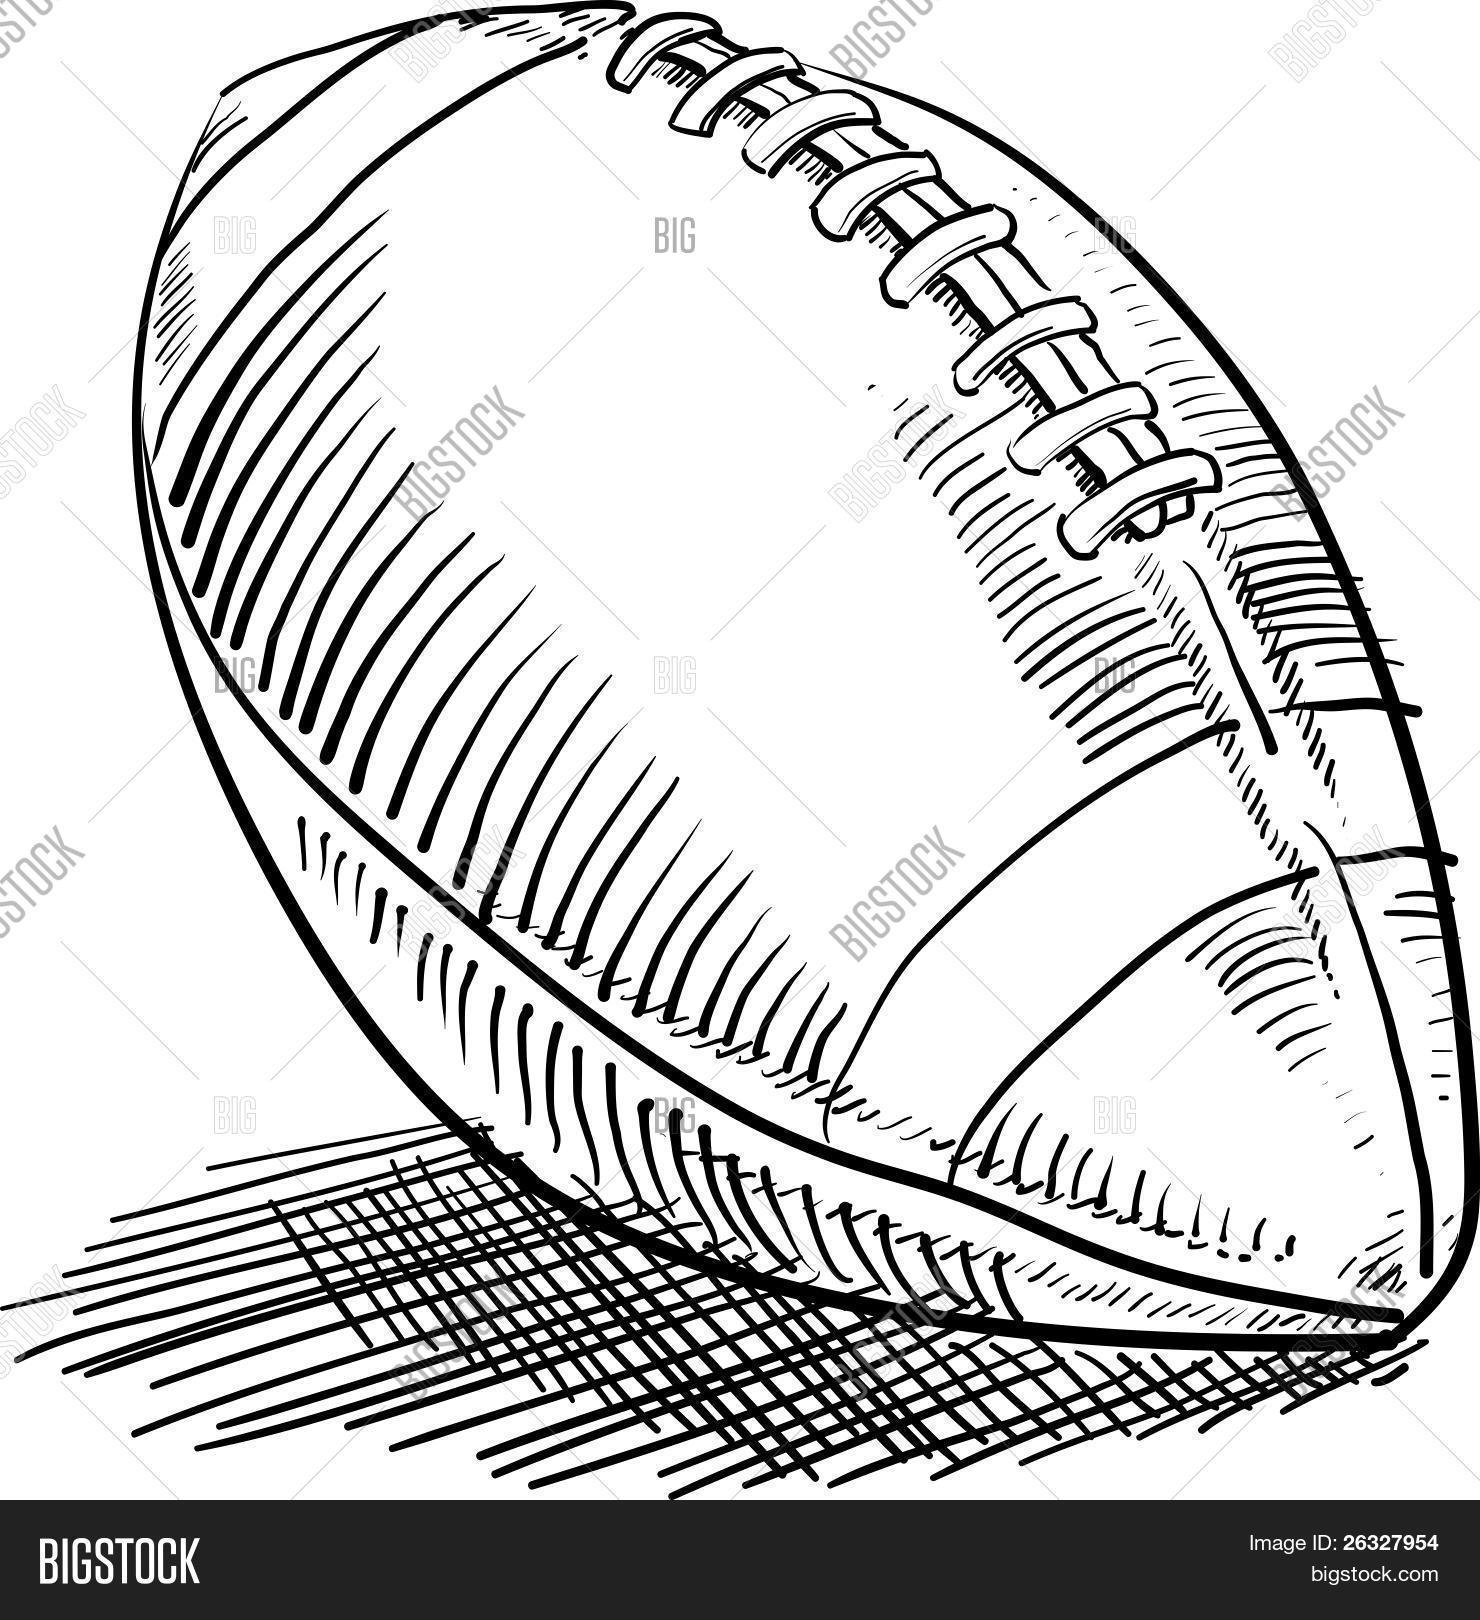 1480x1620 American Football Sketch Vector Amp Photo Bigstock